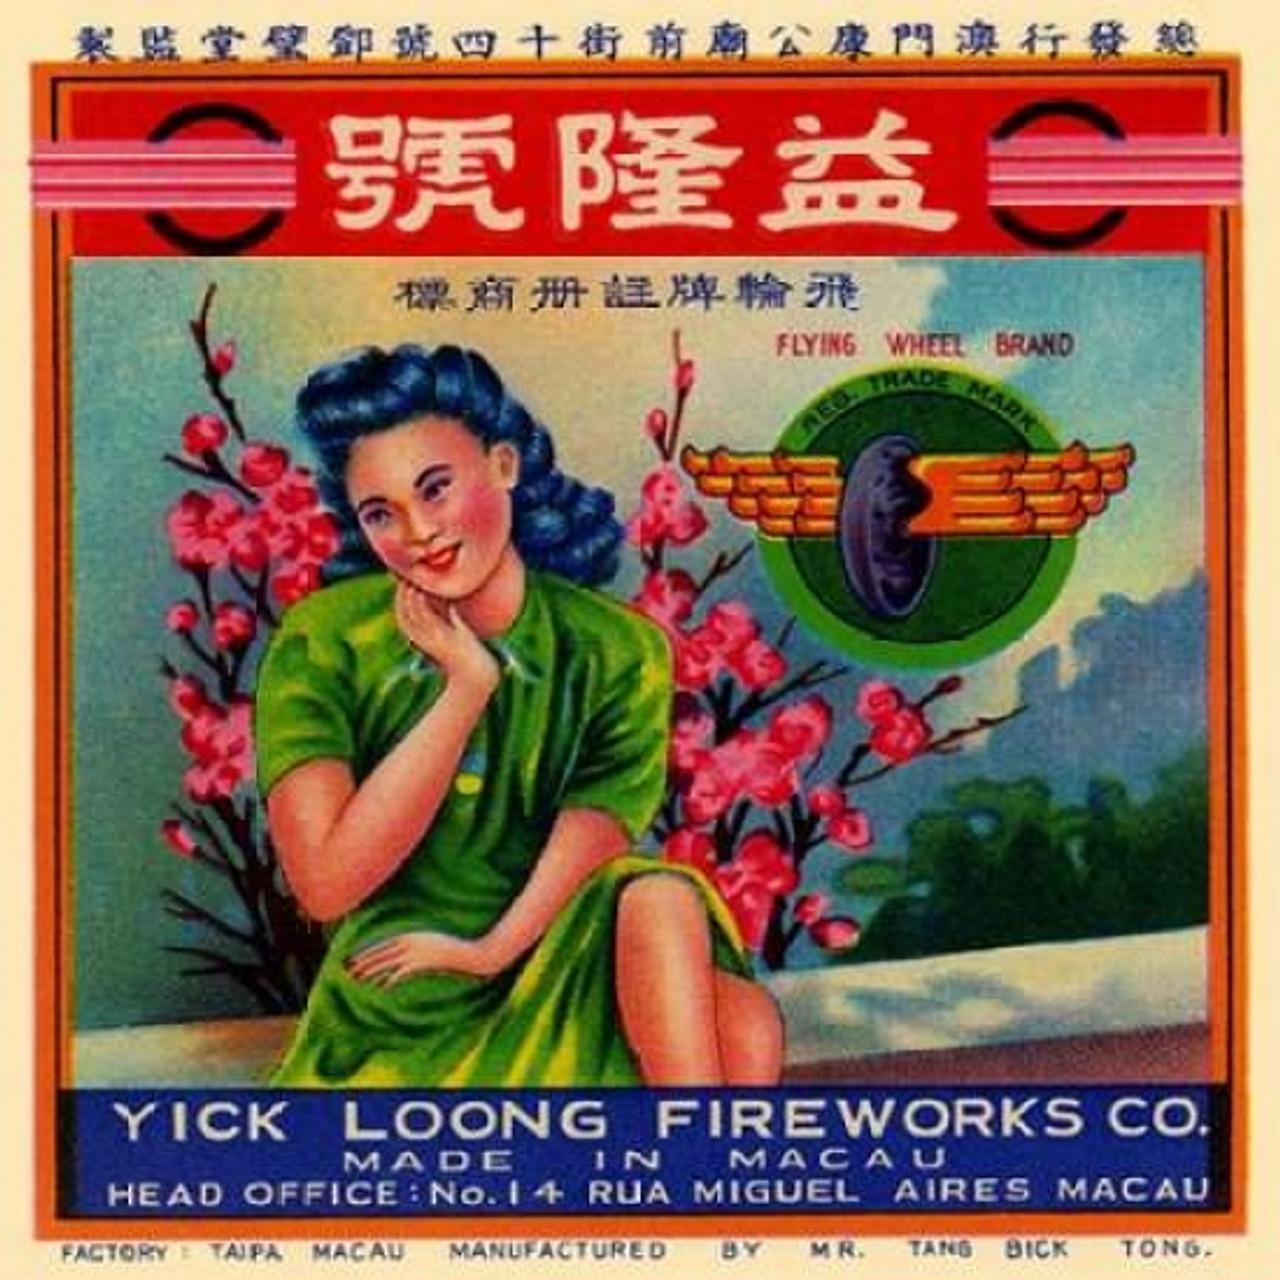 Flying Wheel Brand Flashlight Firecracker Fireworks Co Label Yick Loong 80//16